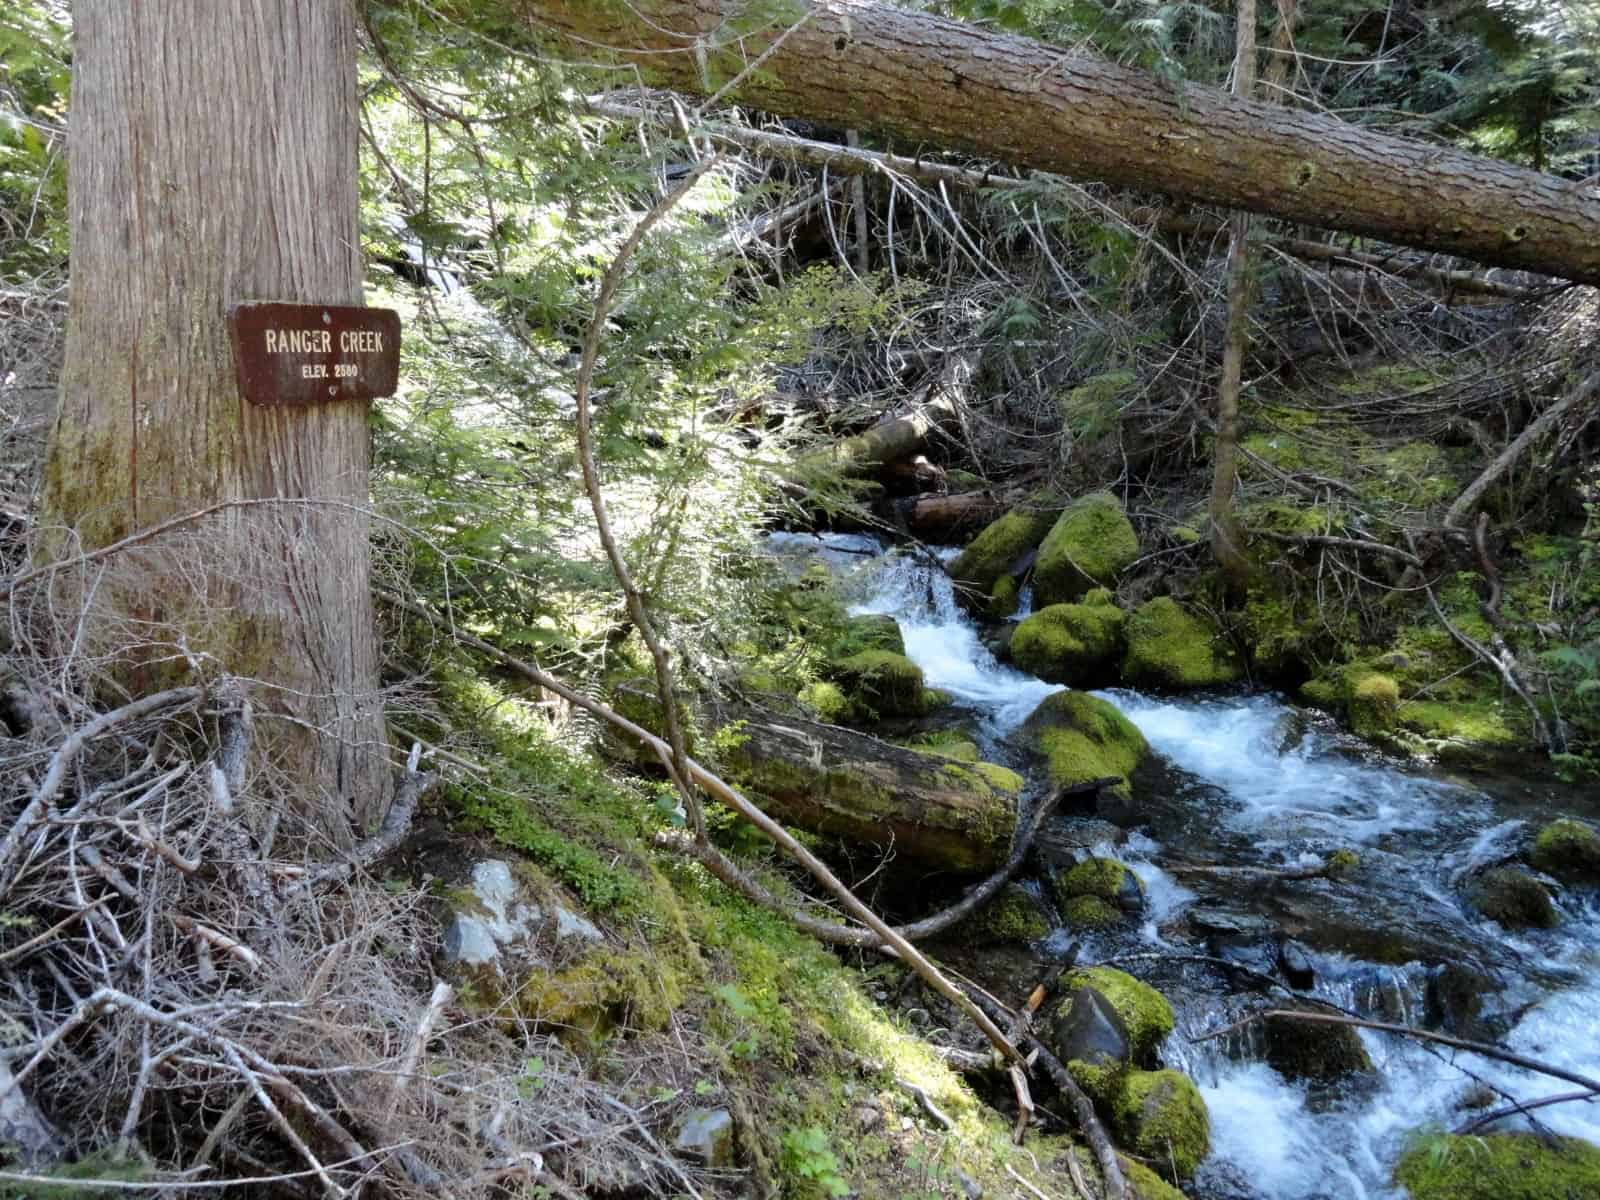 Ranger Creek Trail